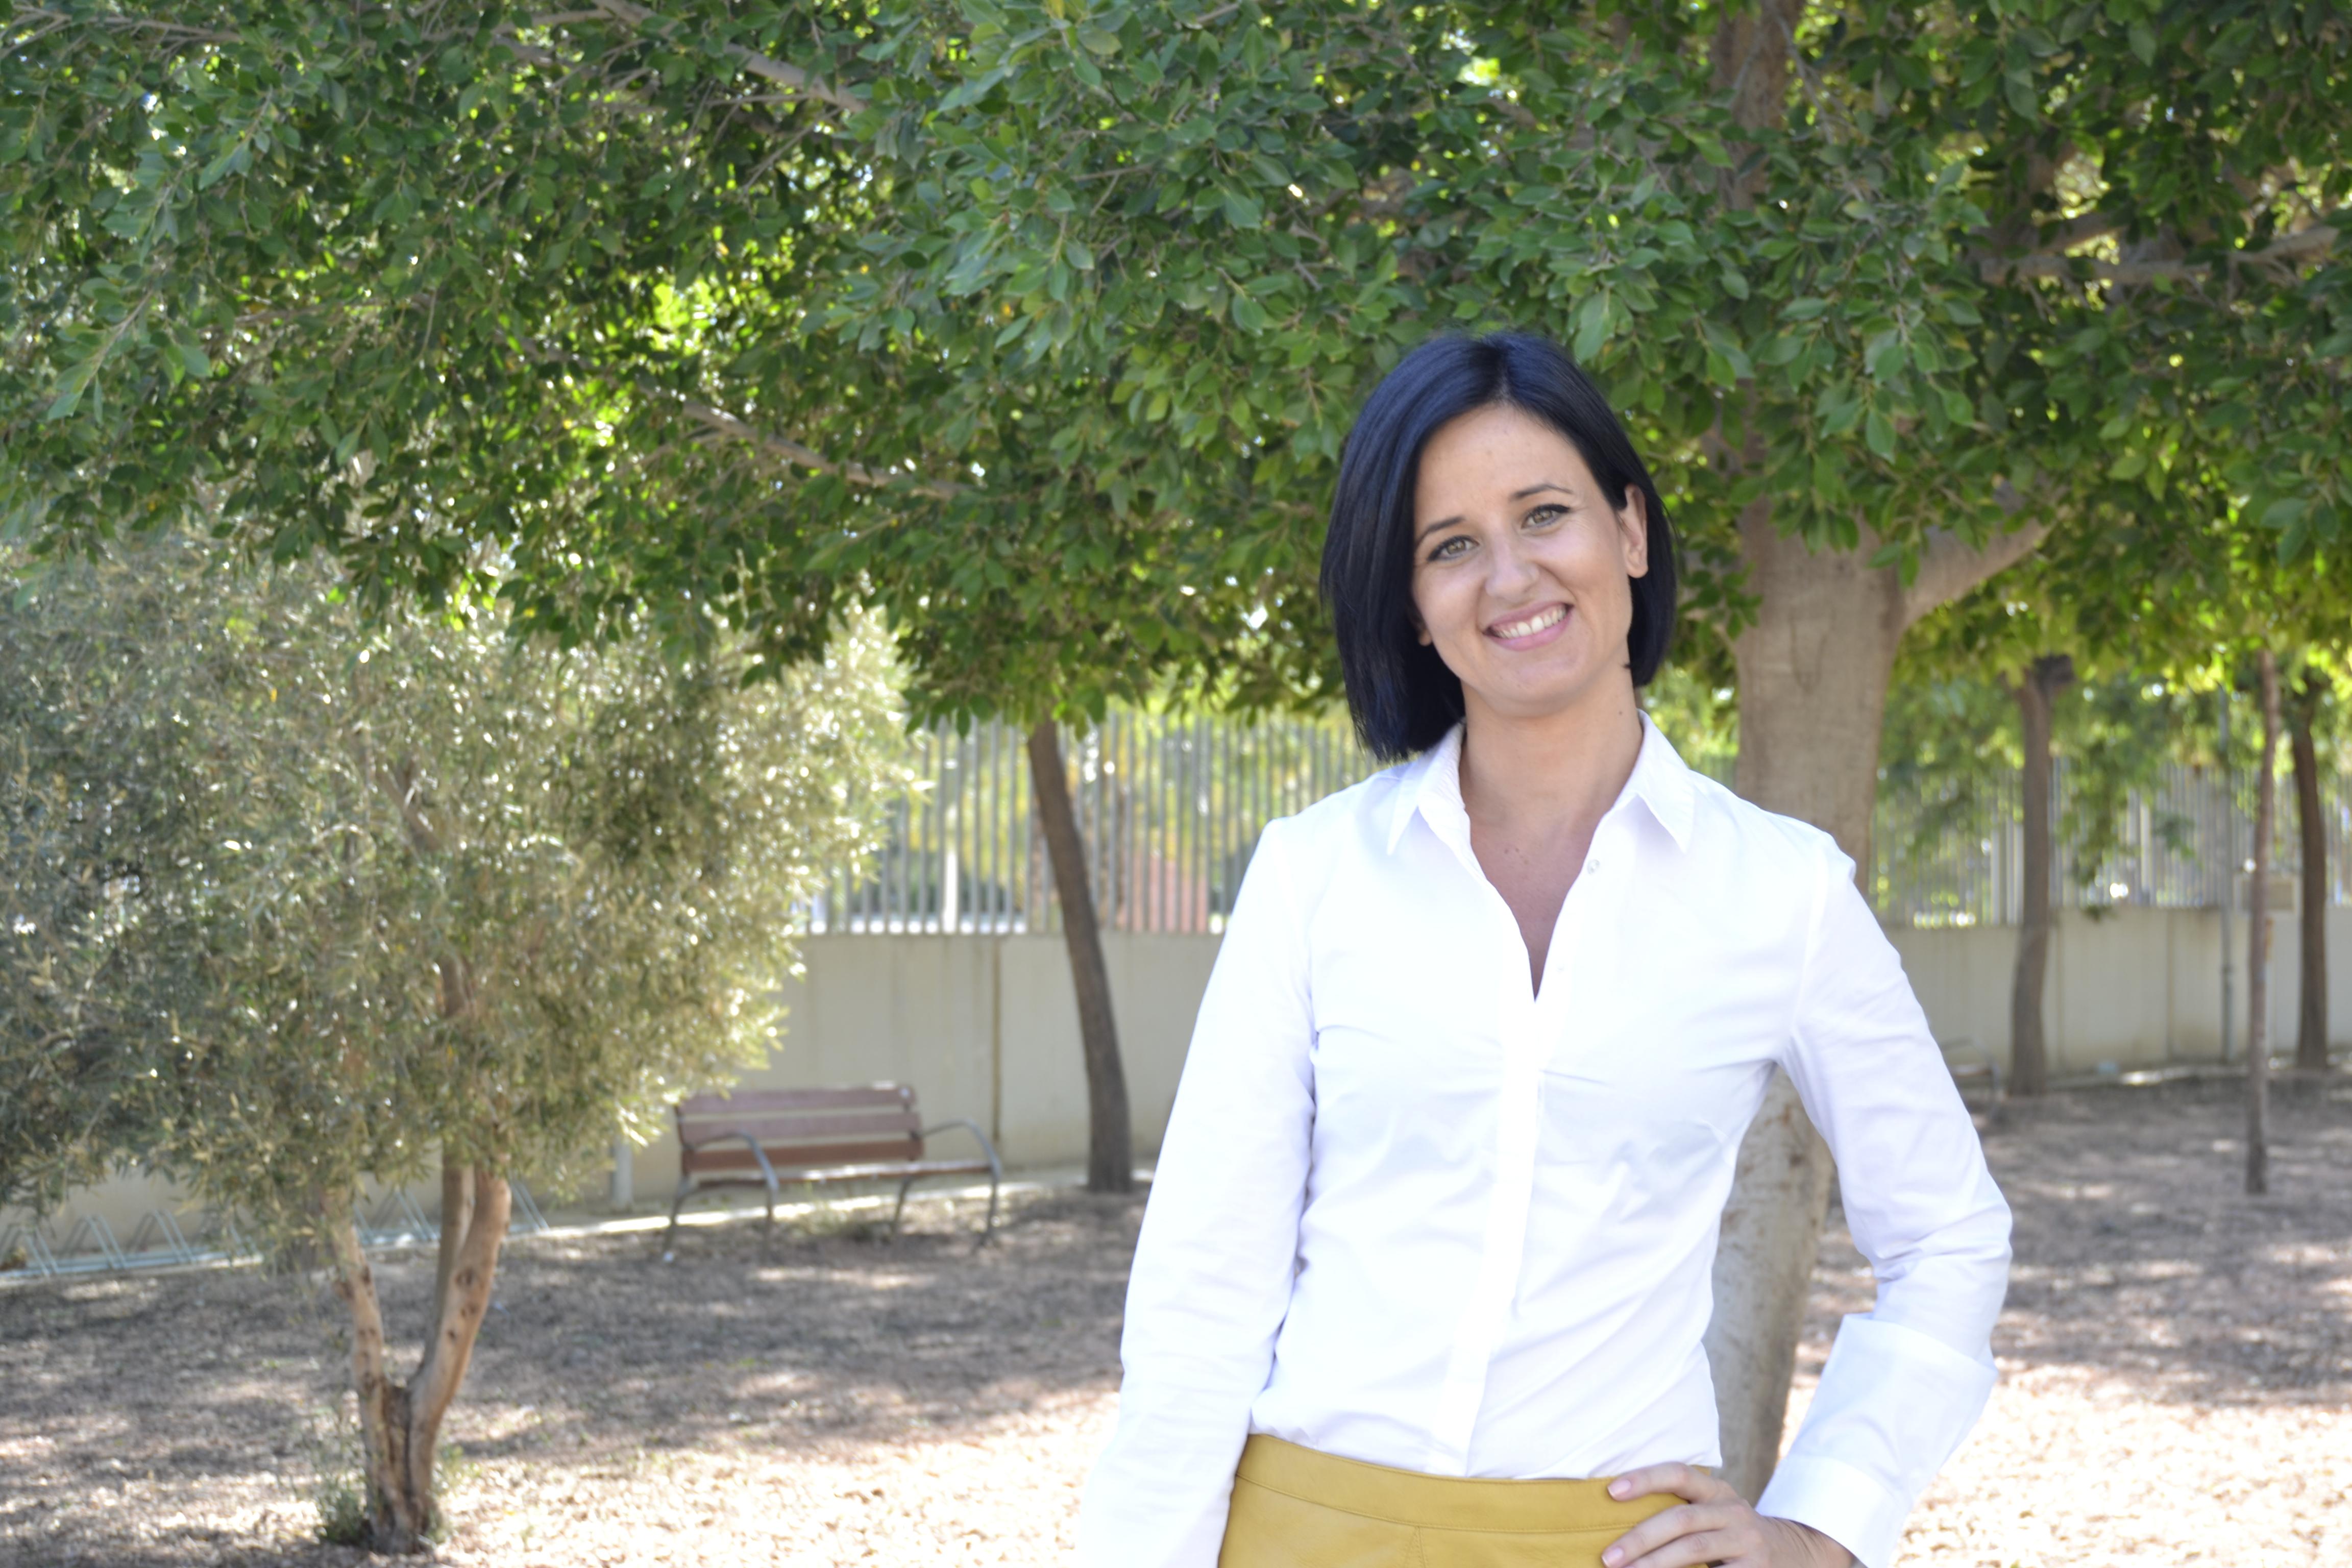 ESTHER GUILABERT DIRECTORA DE LA INSTITUCIÓN FERIAL ALICANTINA (IFA). DOCENTE DE IMEP